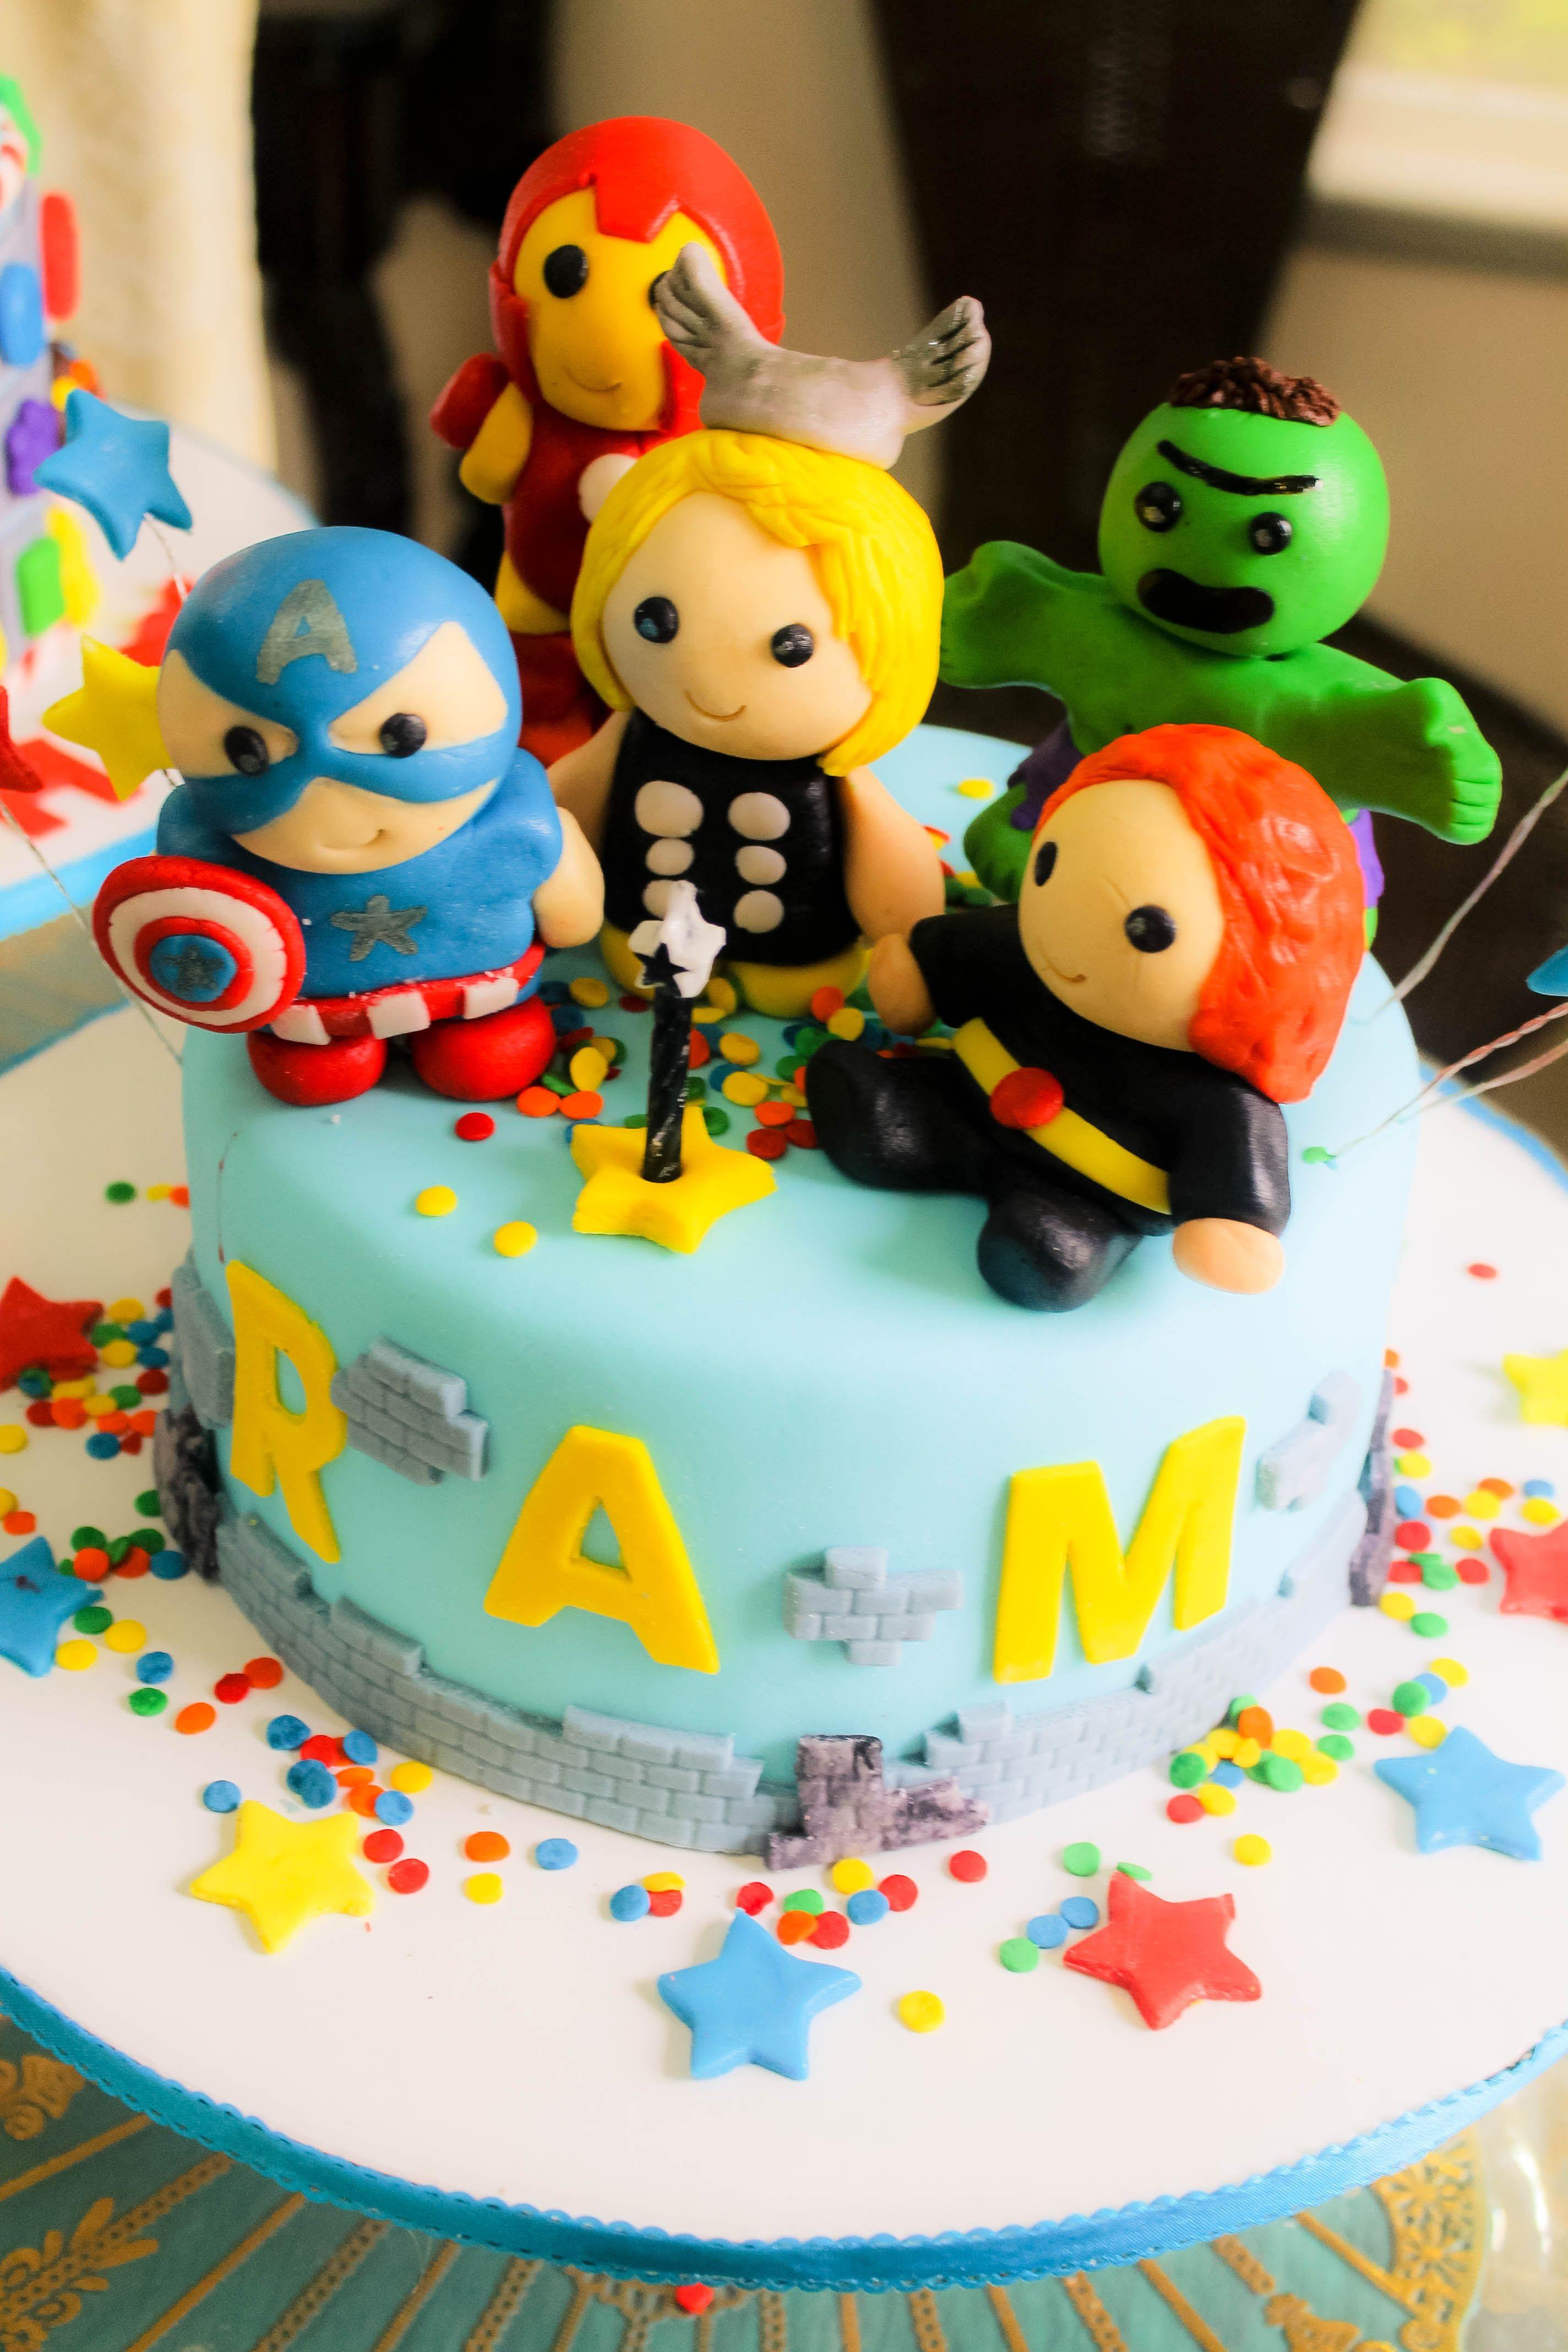 Avengers Chibi Cake Cute Design Diy Idea Party Sweet South